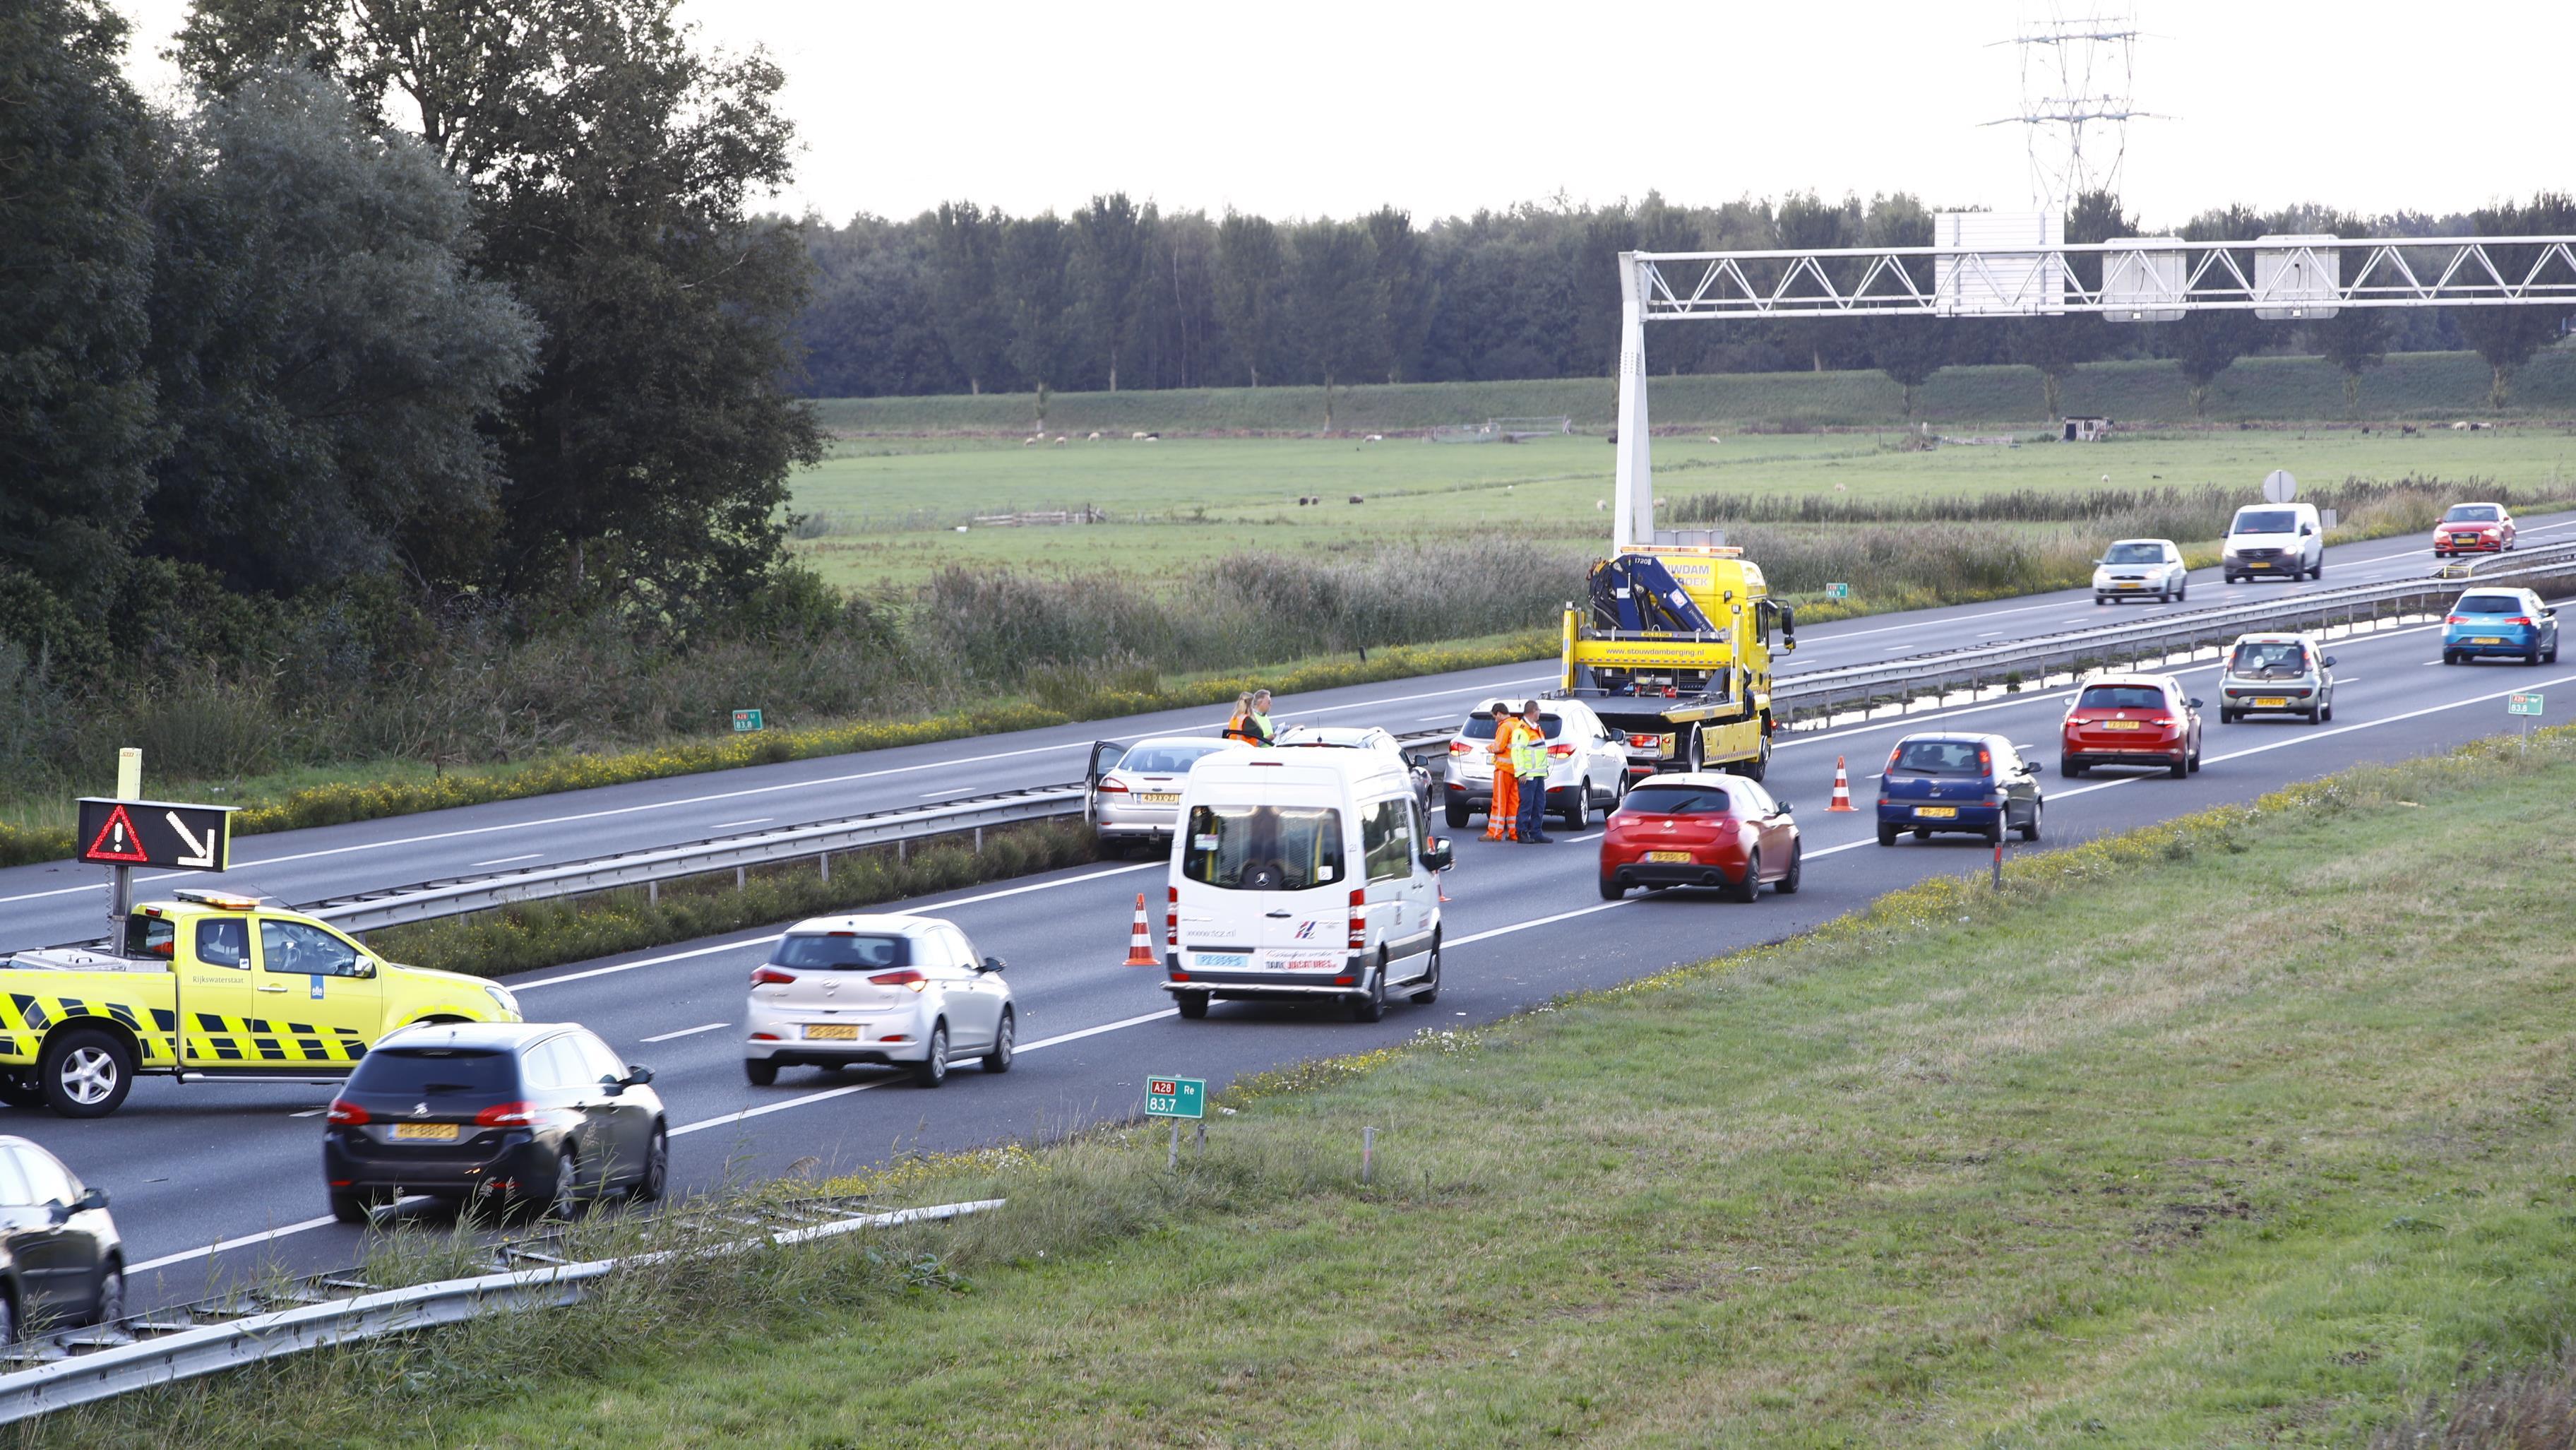 Kop-staartbotsing zorgde voor flinke file op A28 richting Zwolle.